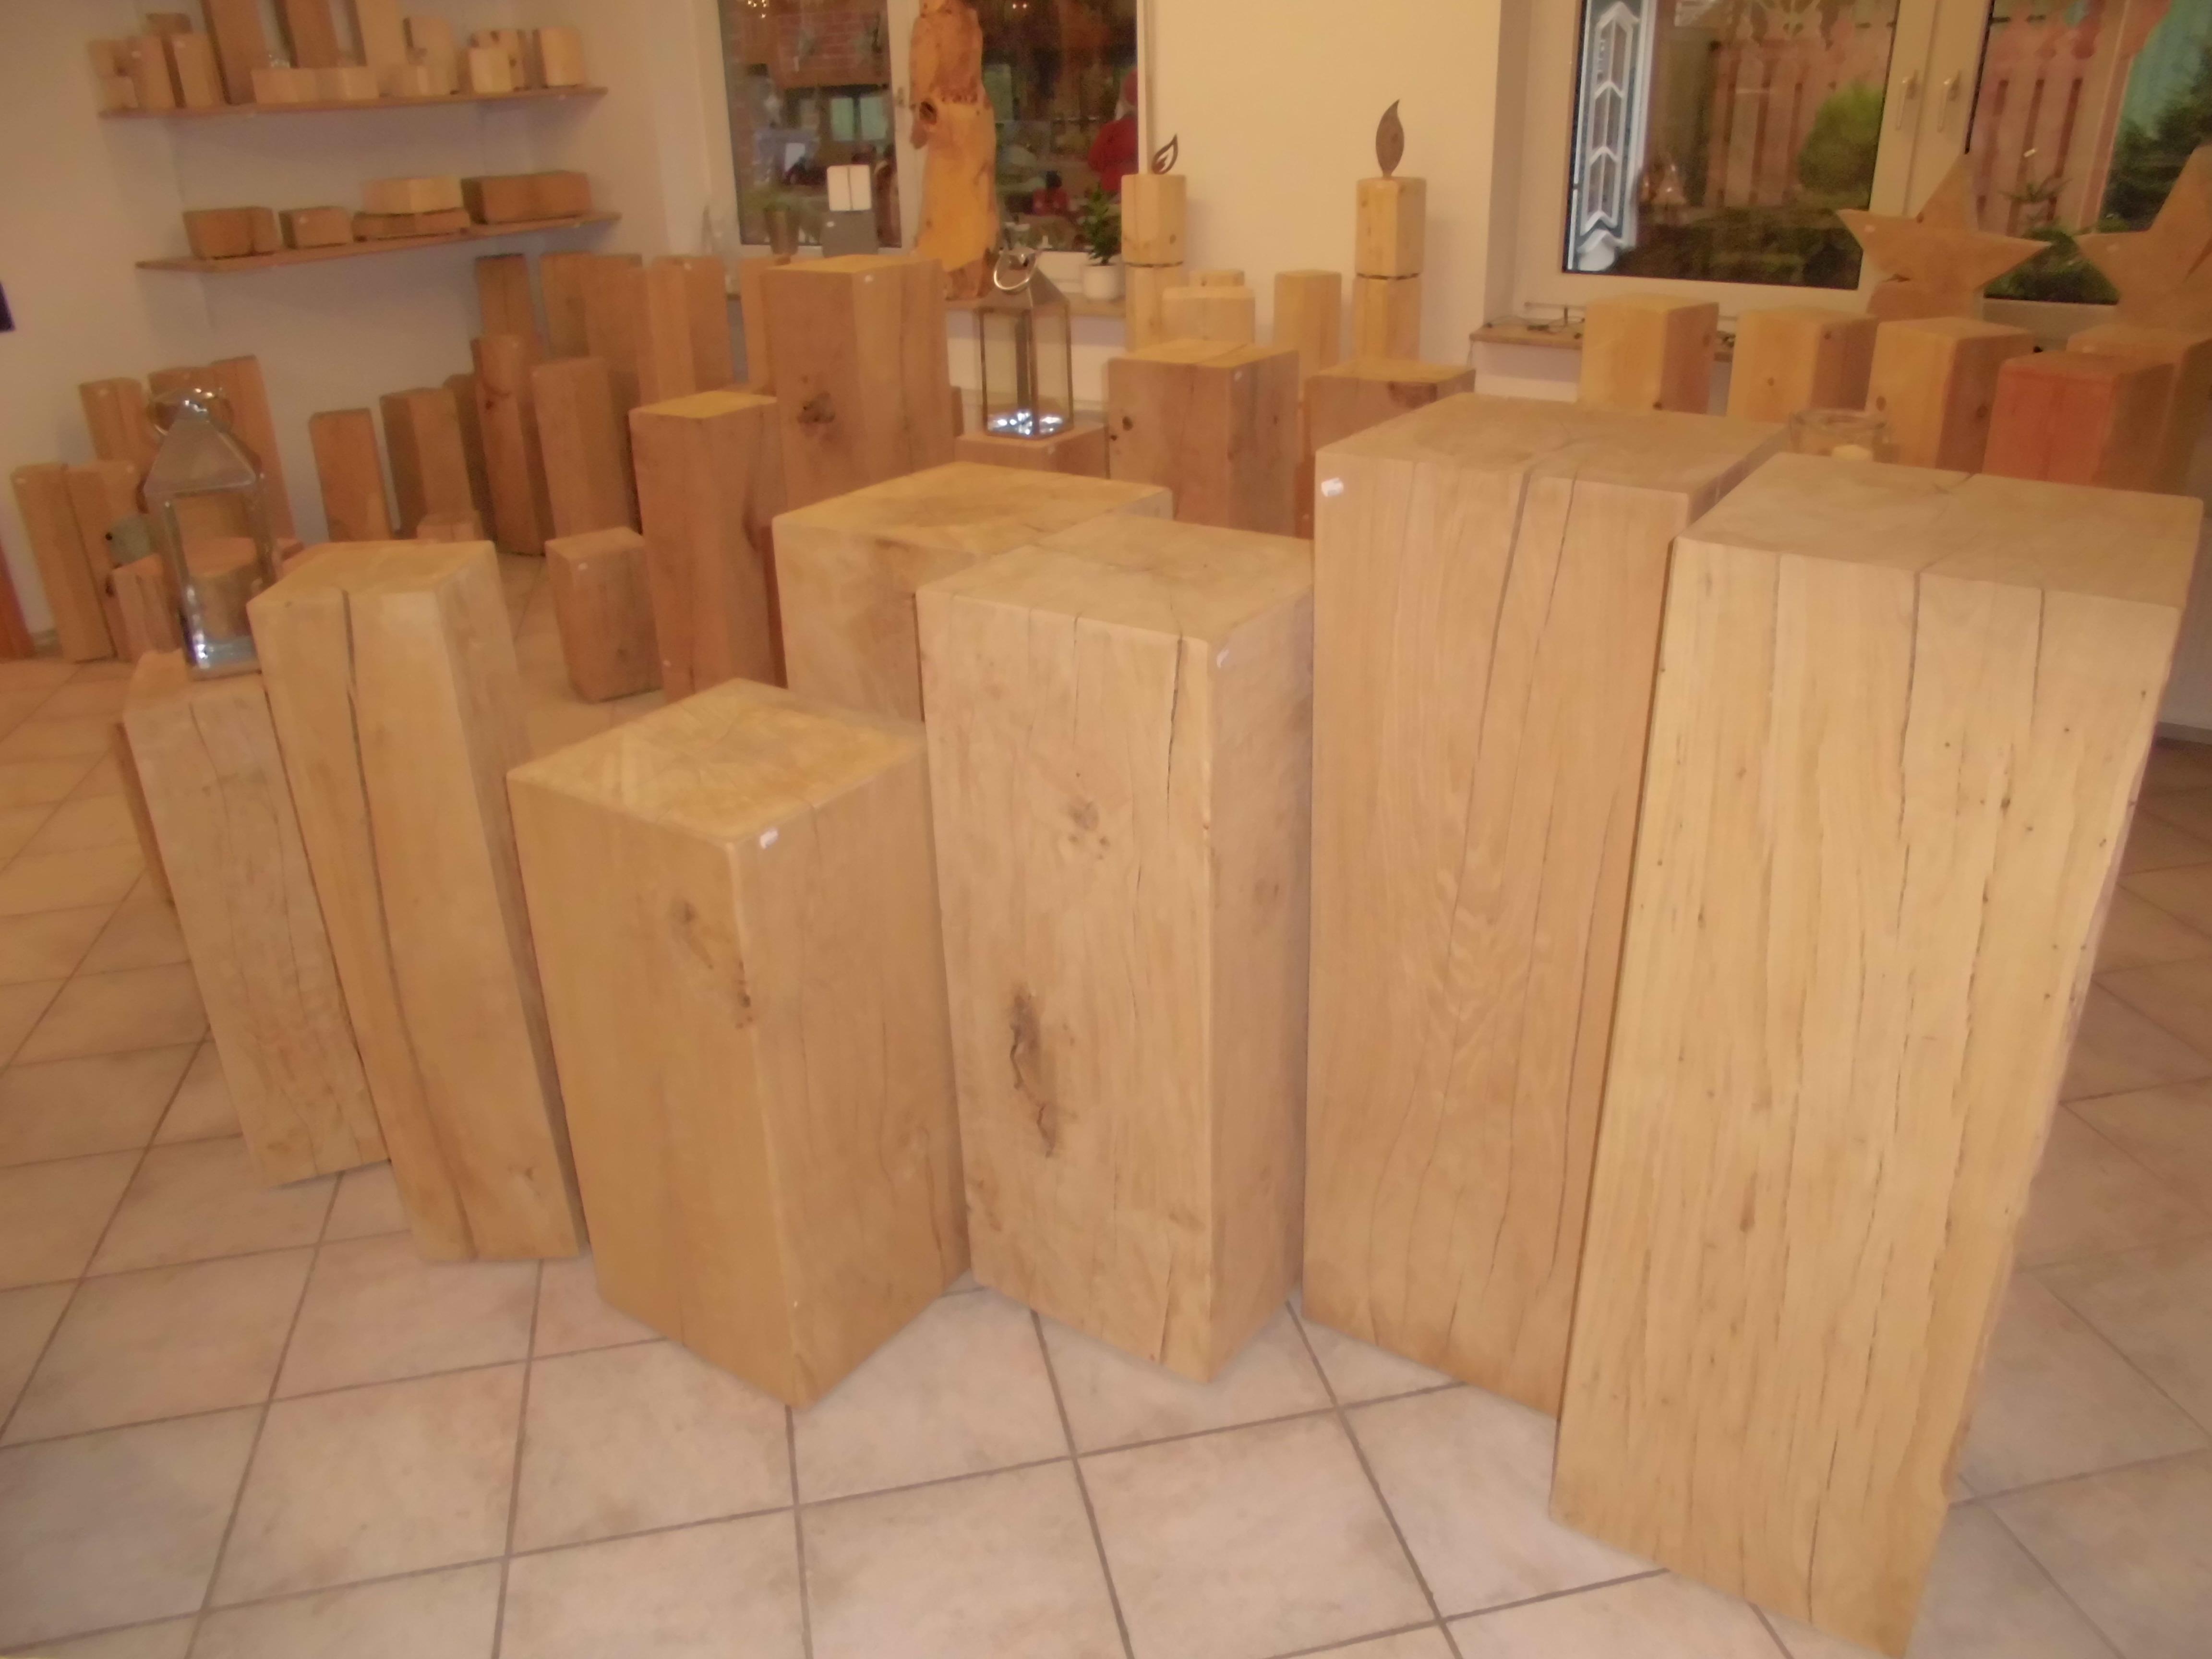 Eichenholzsäule gehobelt, geschliffen, angefast 25x25x60cm